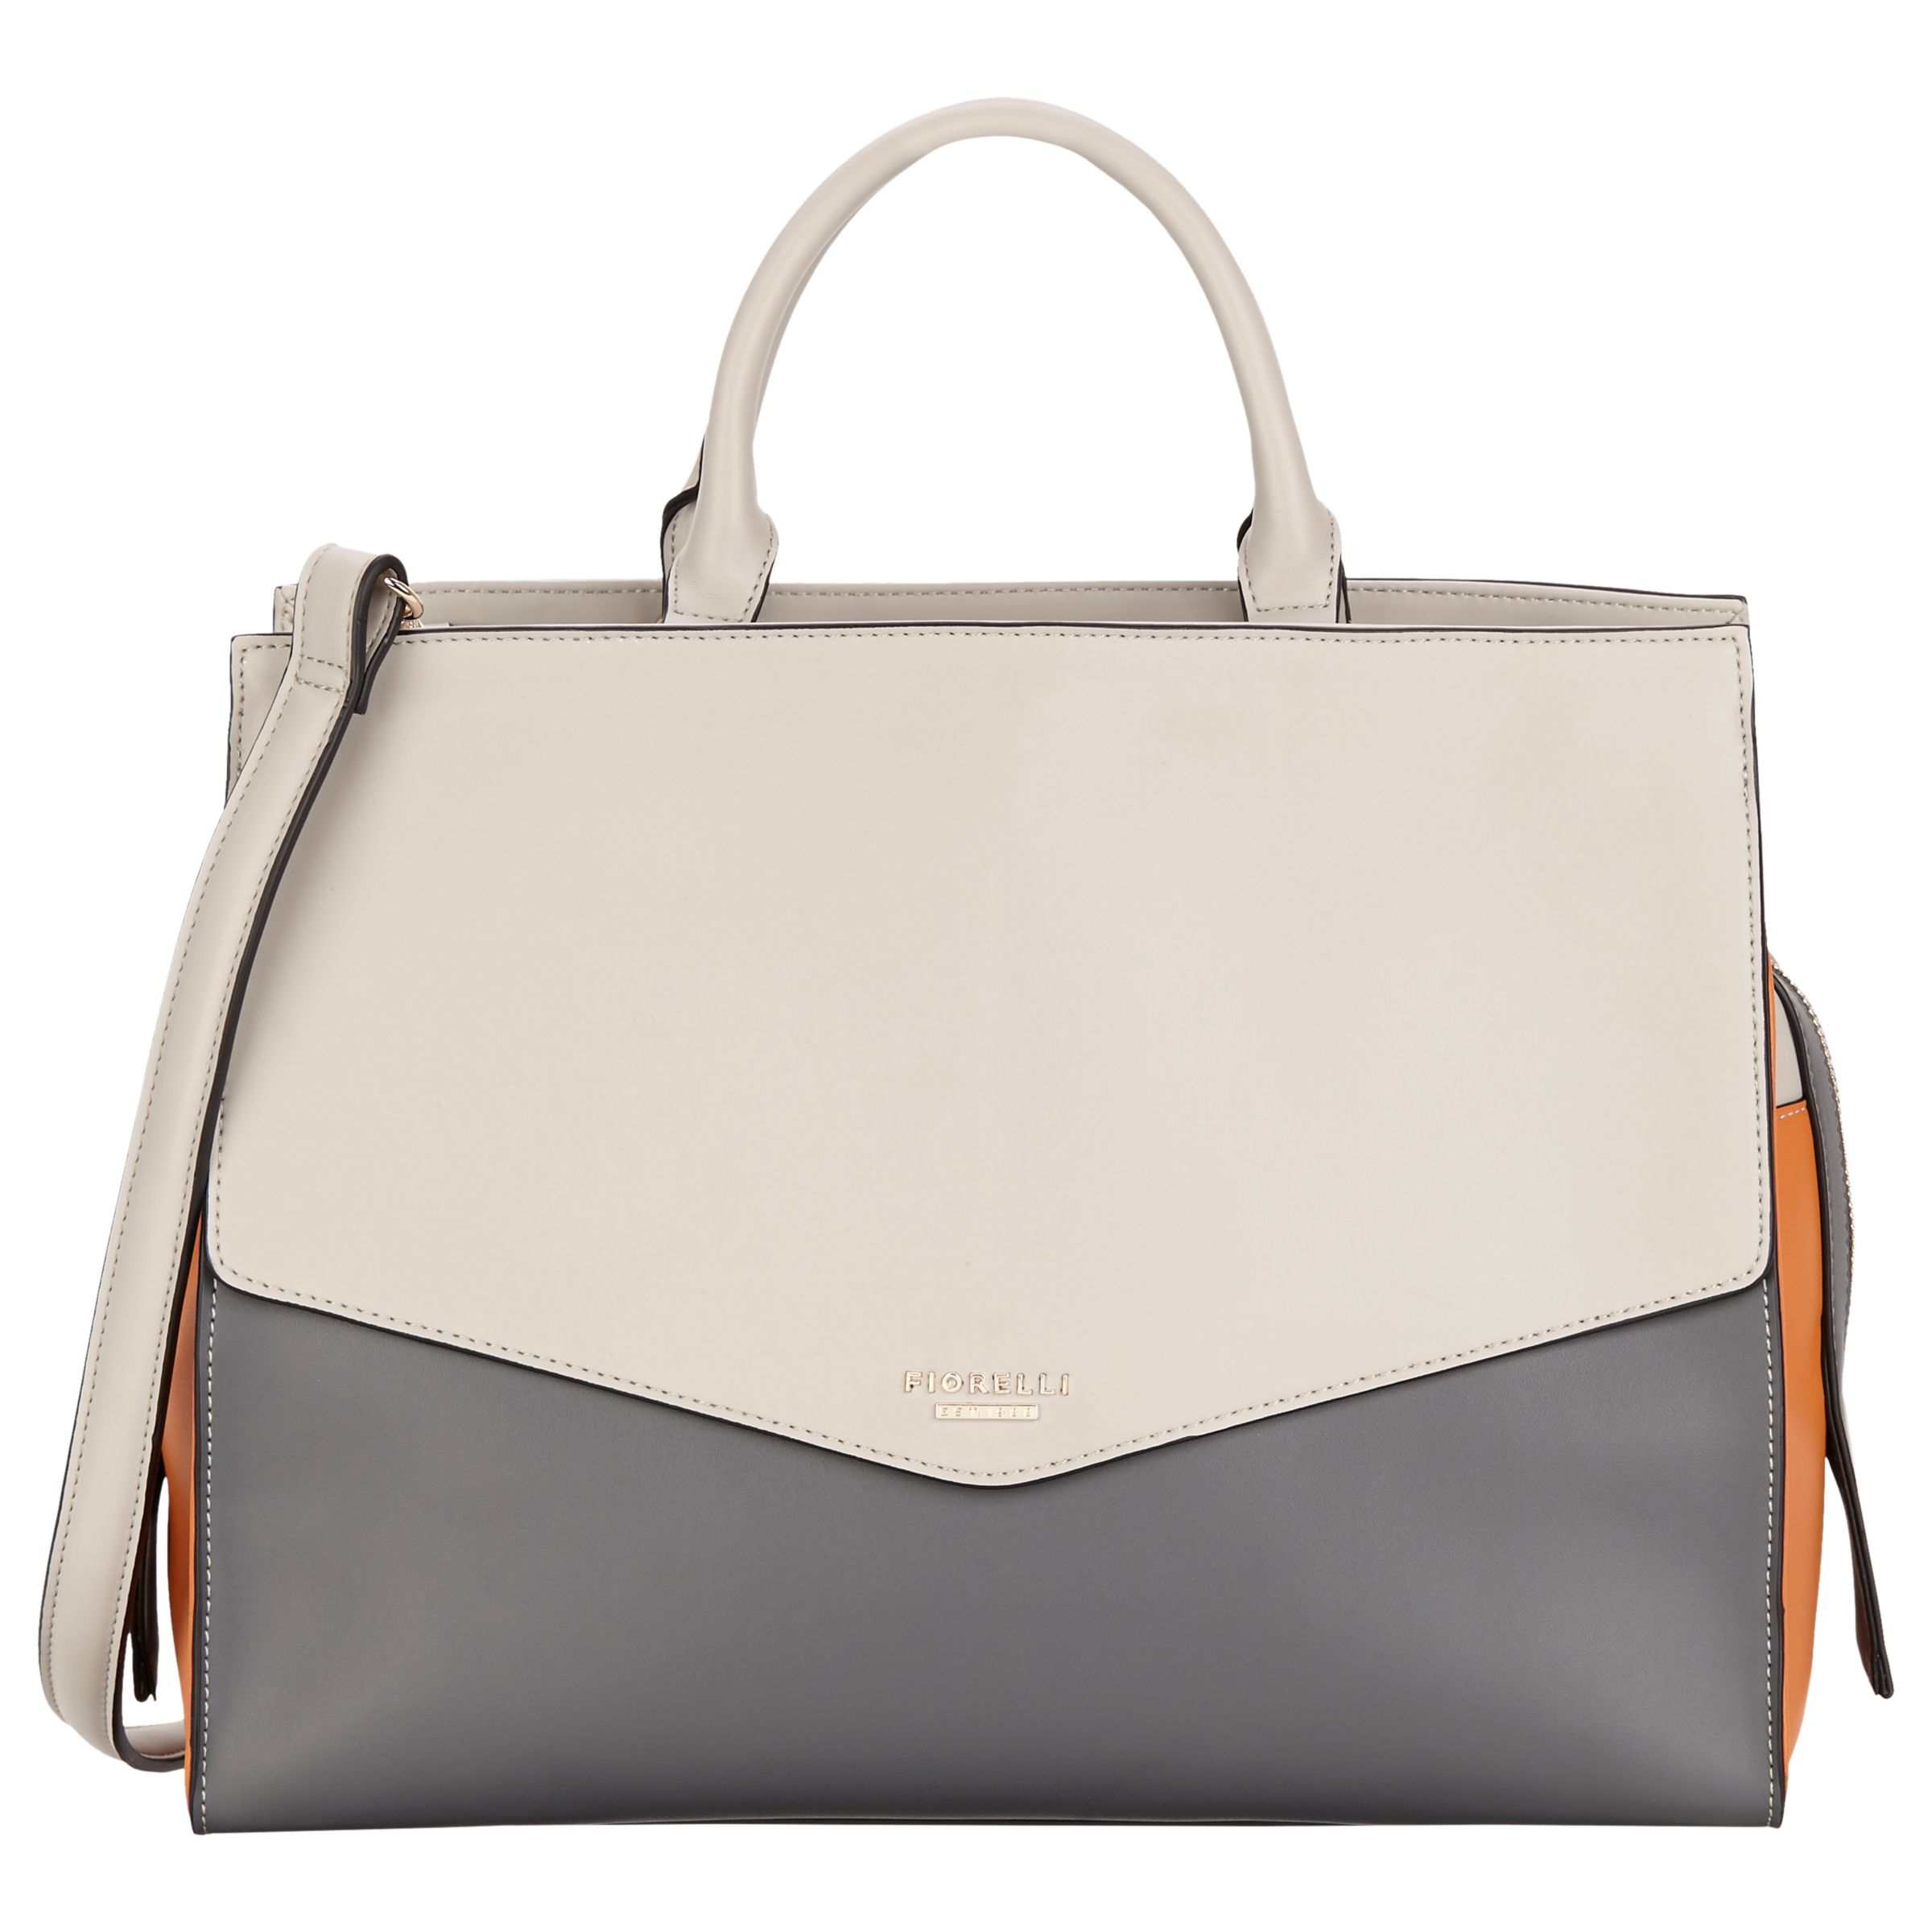 Fiorelli Fiorelli Mia Large Grab Bag